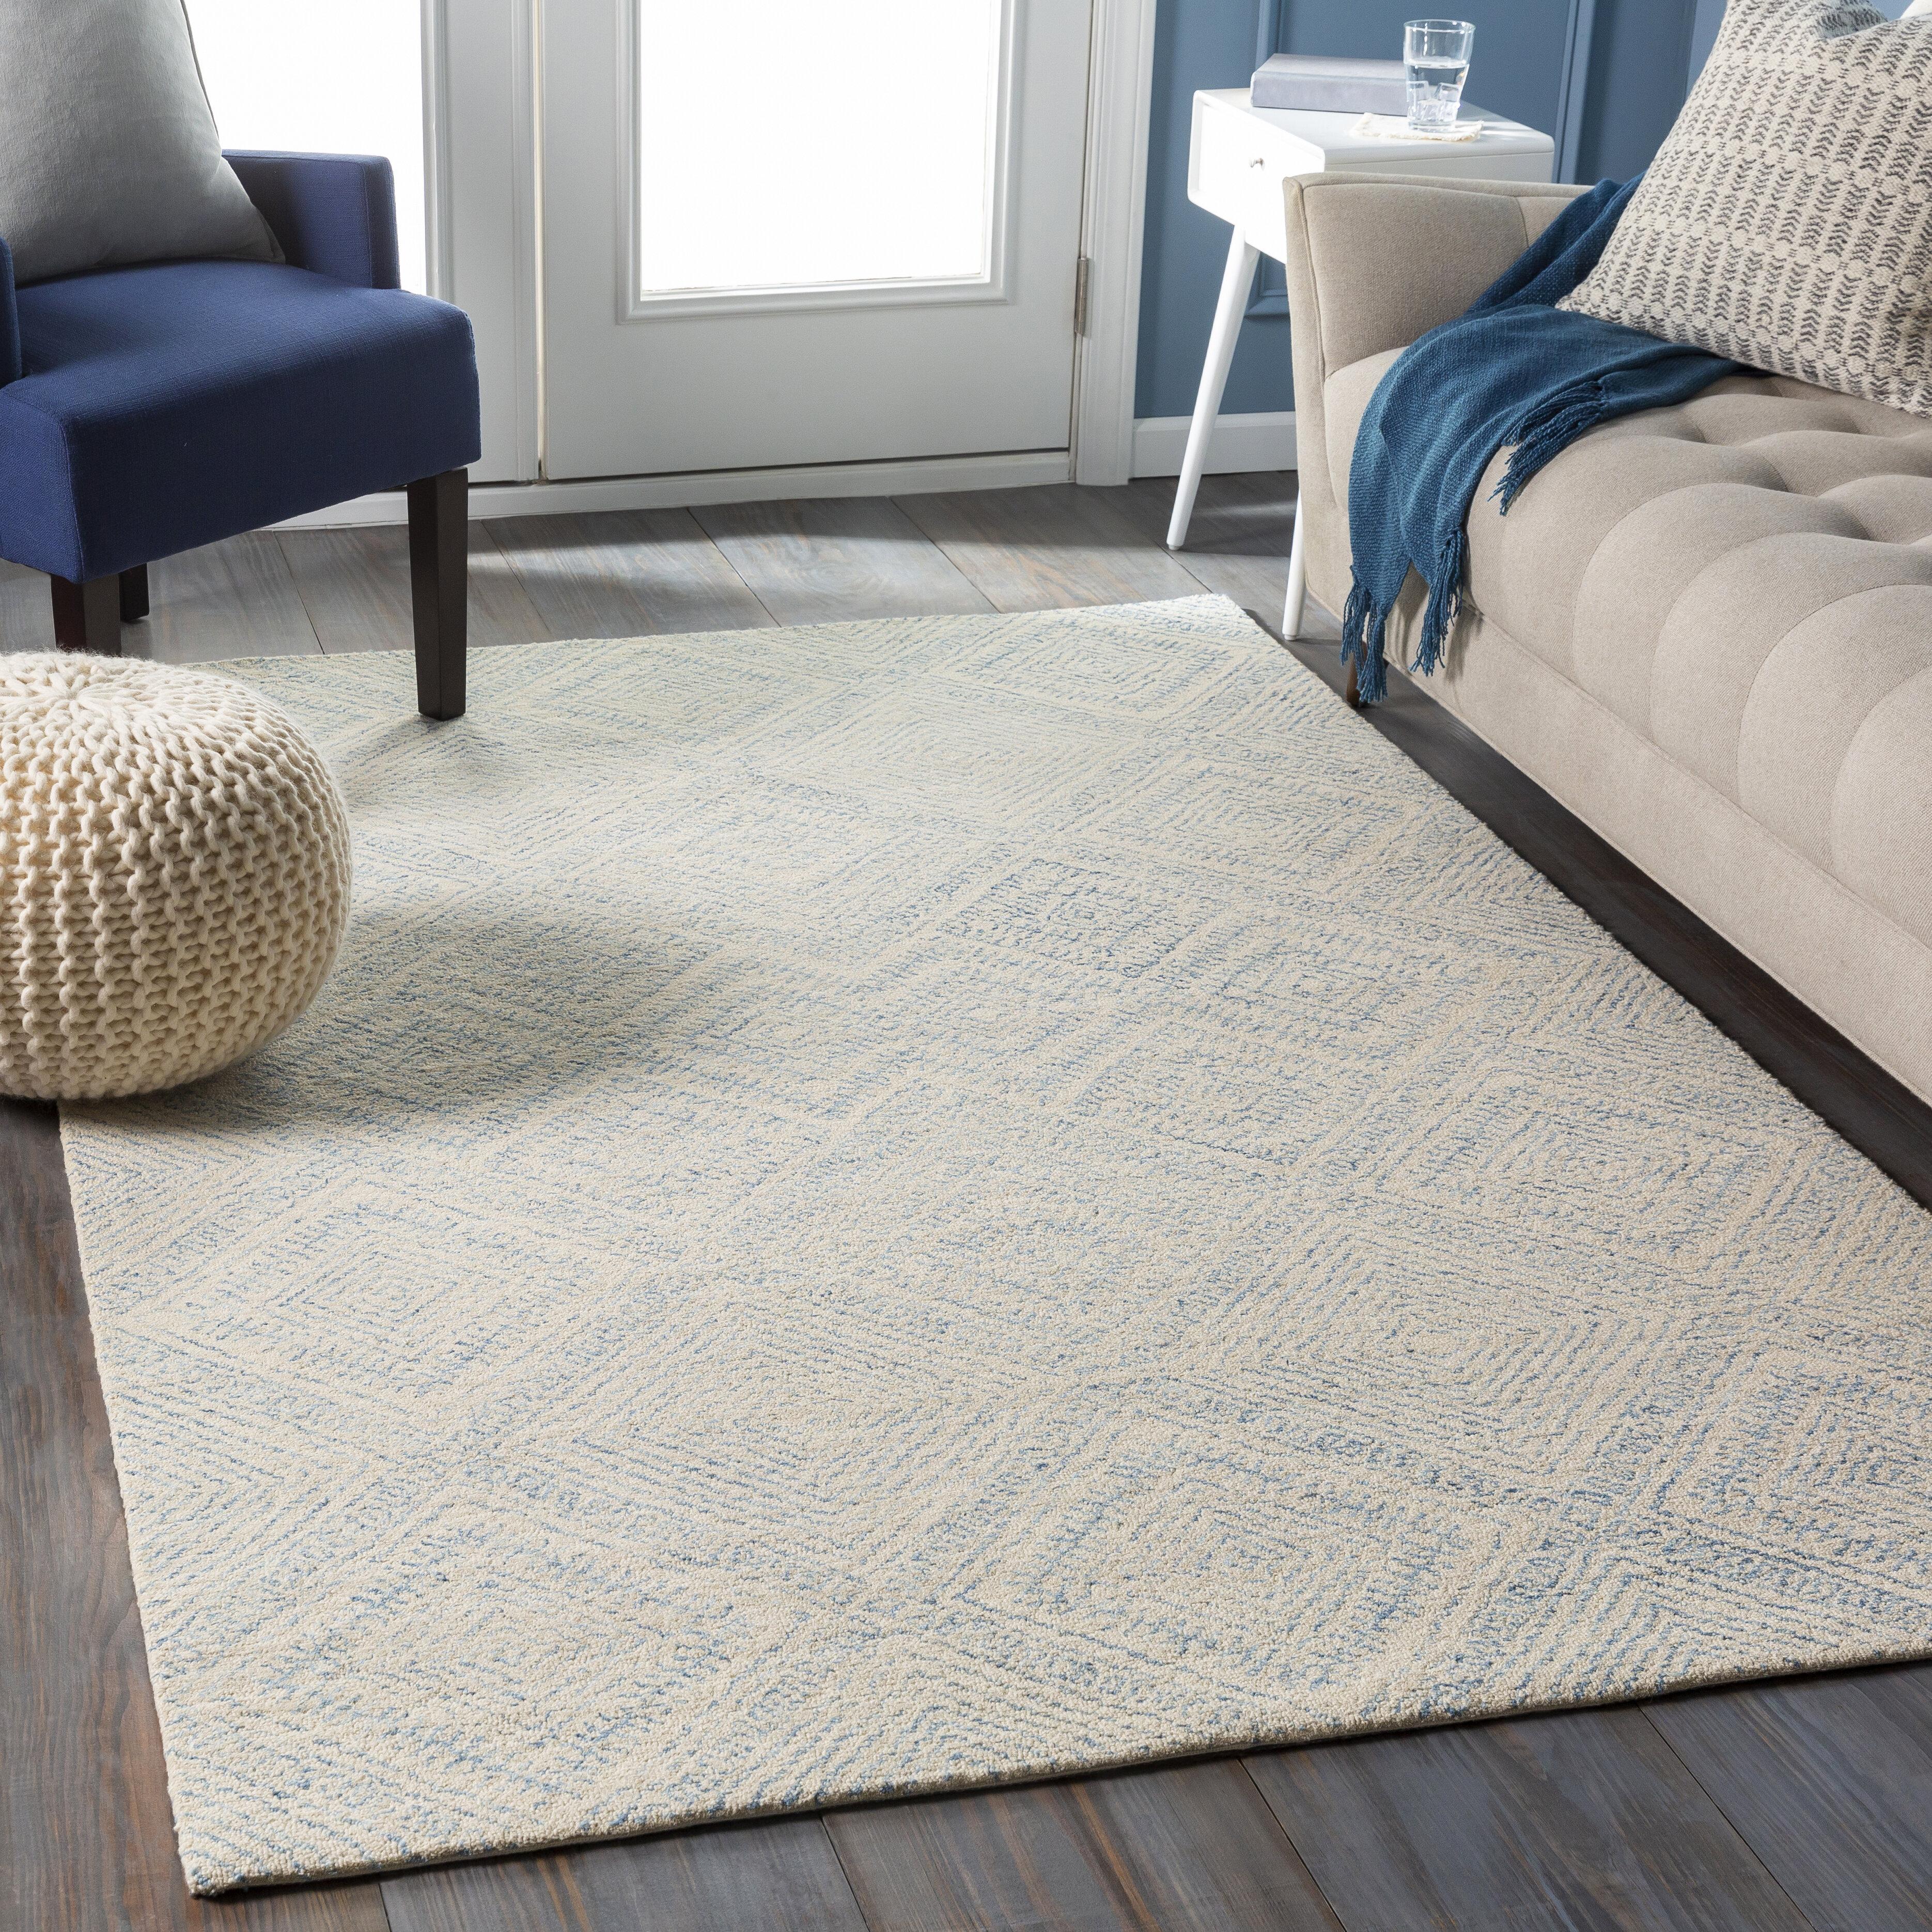 Foundry Select Pittsfield Geometric Handmade Tufted Wool Beige Area Rug Wayfair